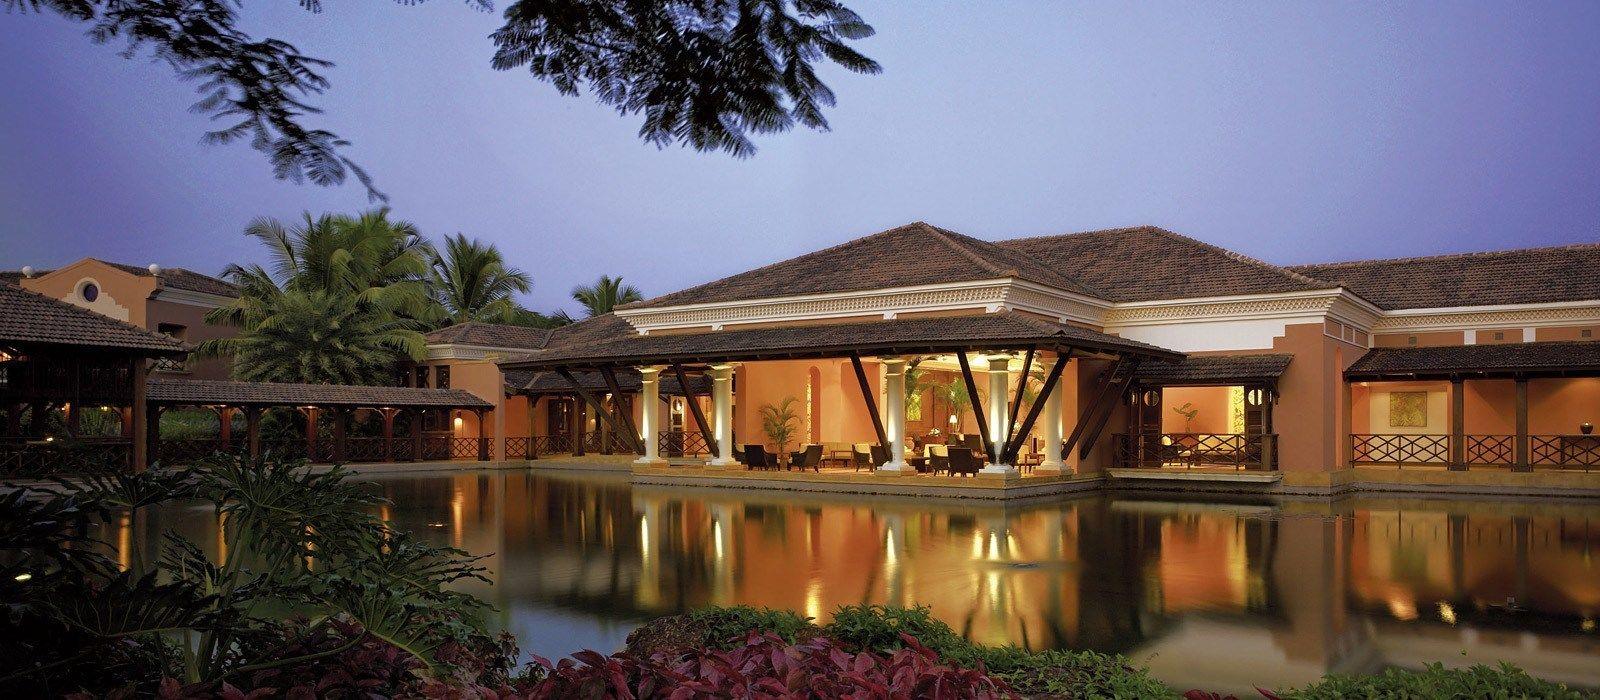 Hotel Park Hyatt Goa Zentral- & Westindien